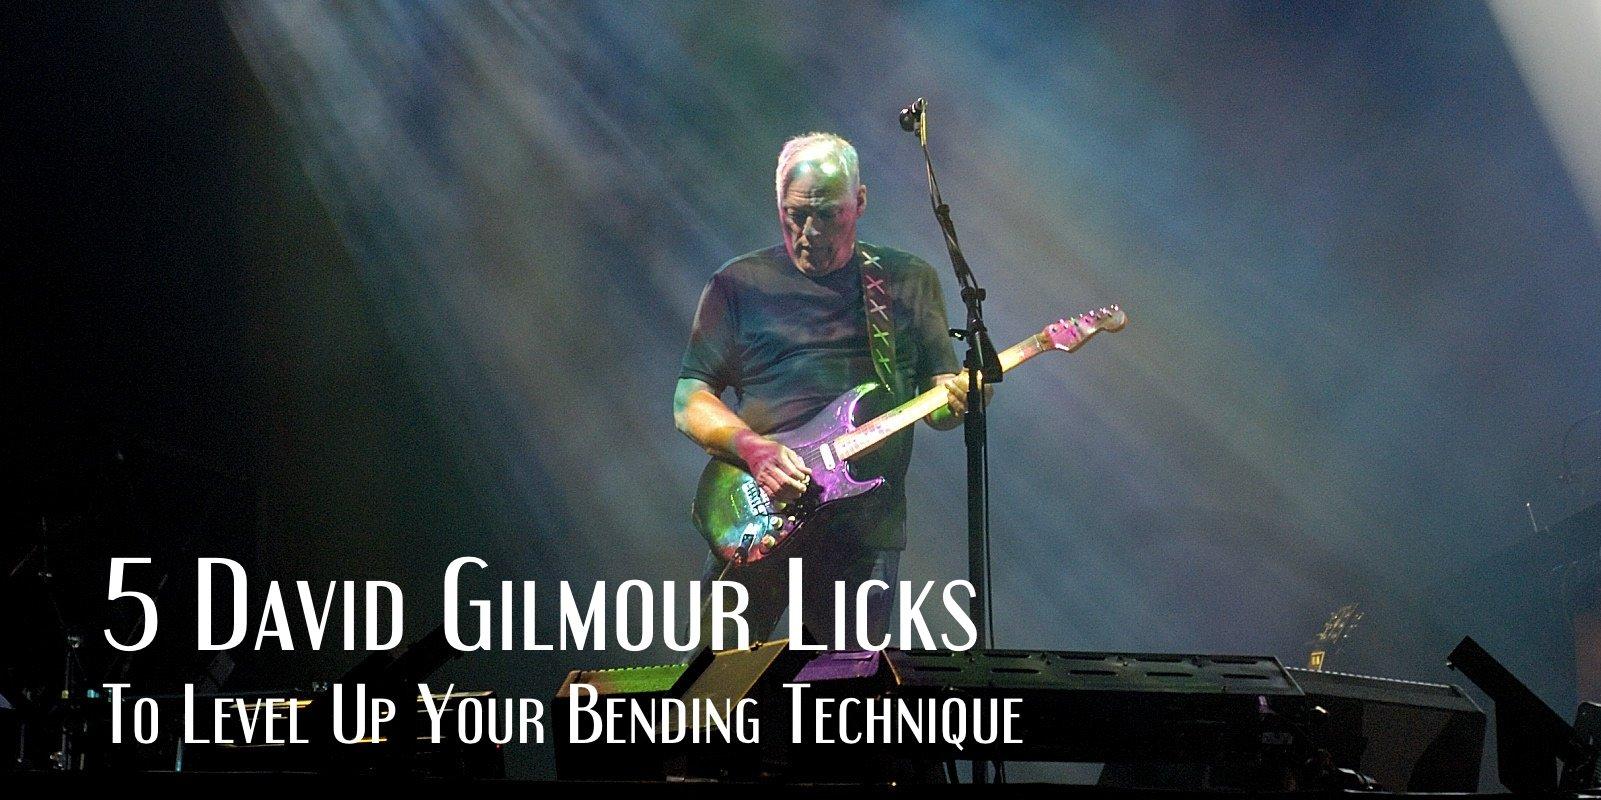 David Gilmour licks